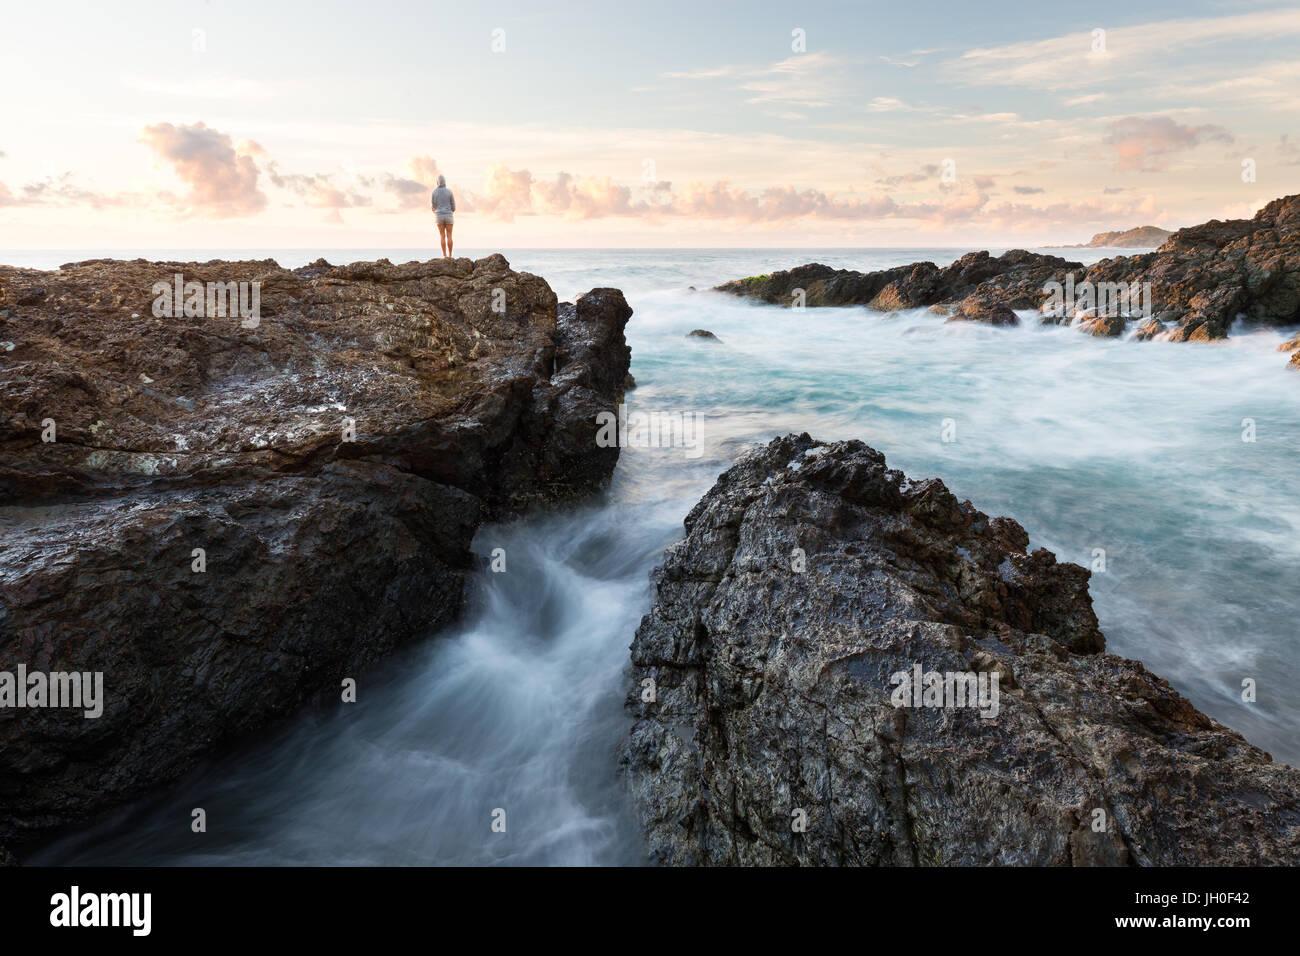 A person watches the sun rise over the ocean in a beautiful rocky seascape scene in Port Macquarie, Australia. - Stock Image